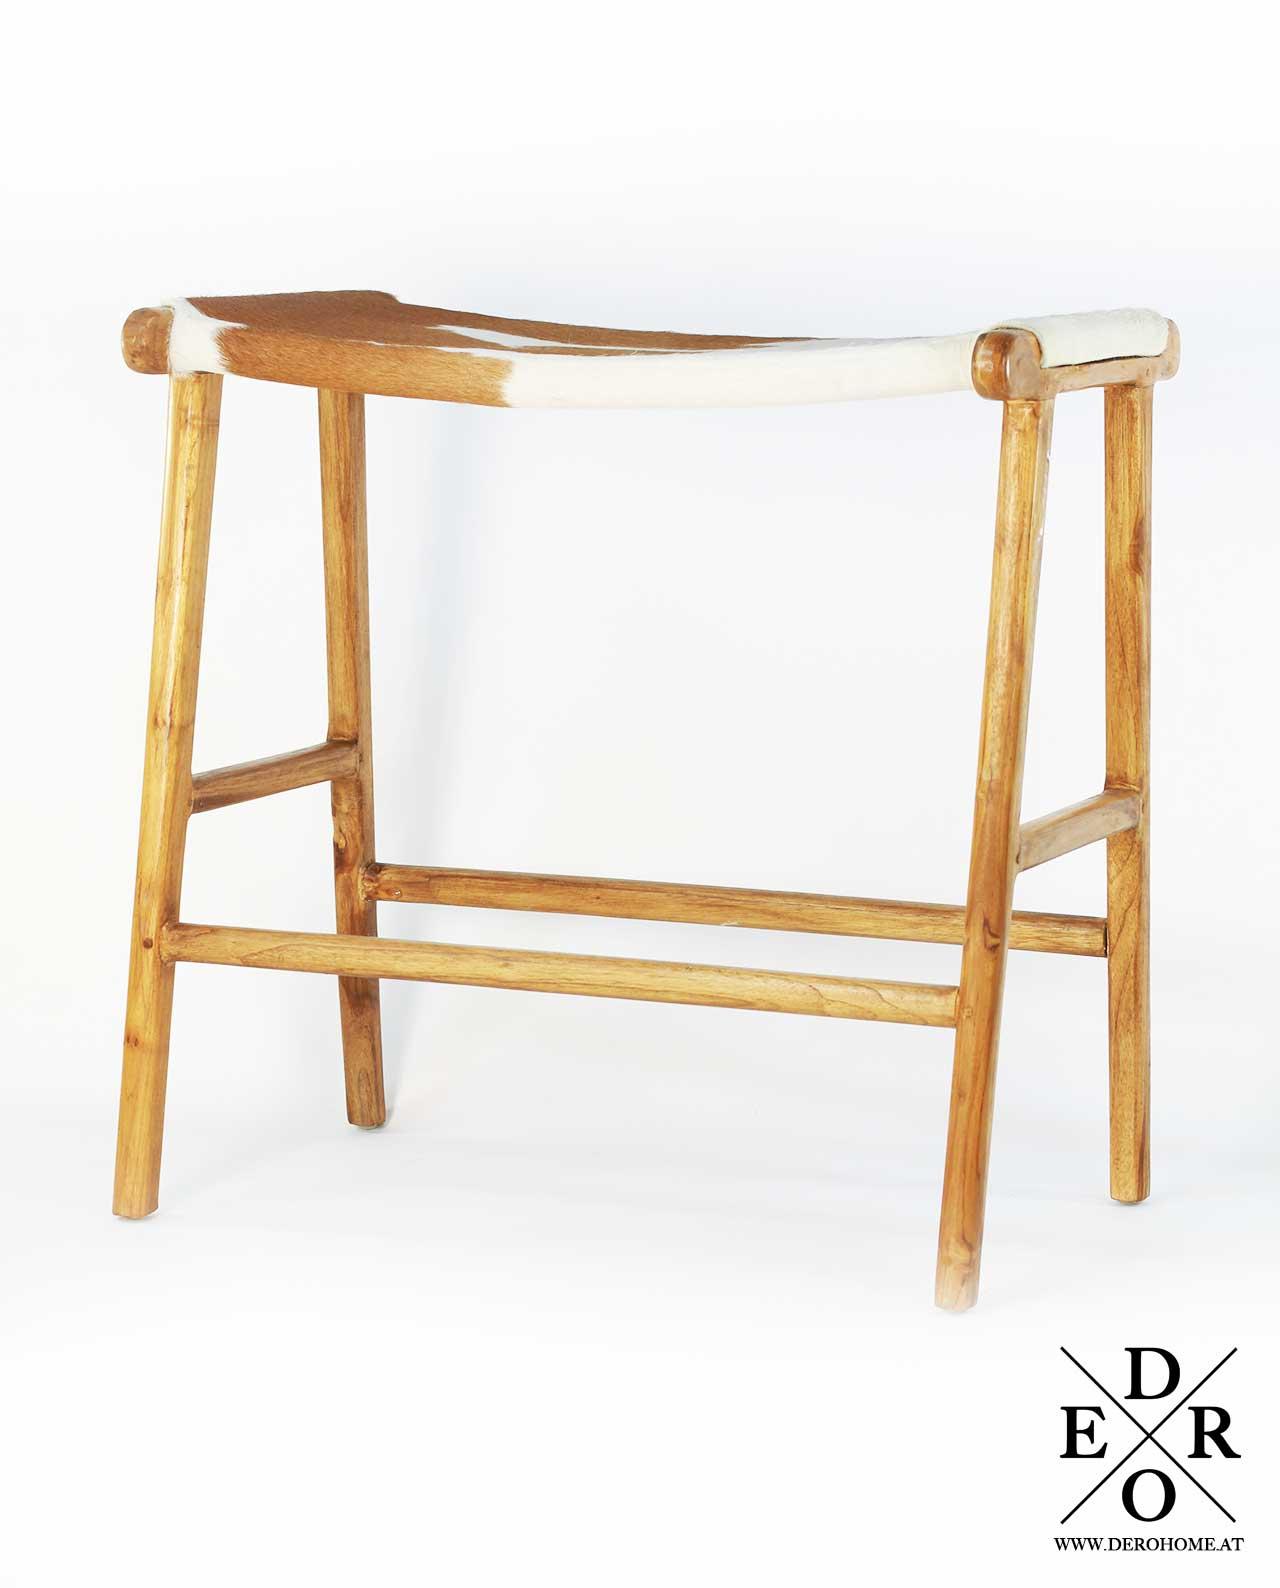 fell hocker texas derohome at. Black Bedroom Furniture Sets. Home Design Ideas